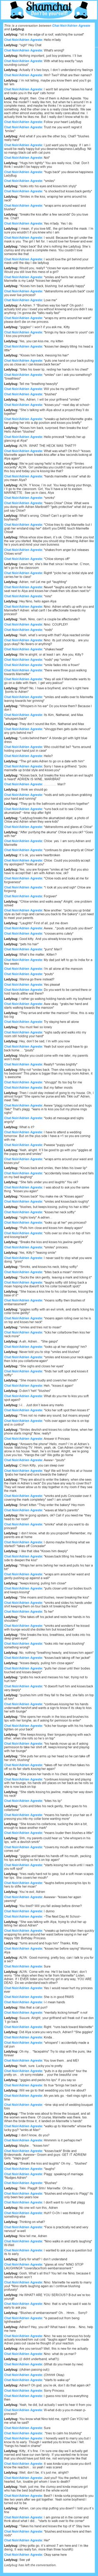 A conversation between Ladybug and Chat Noir/Adrien Agreste